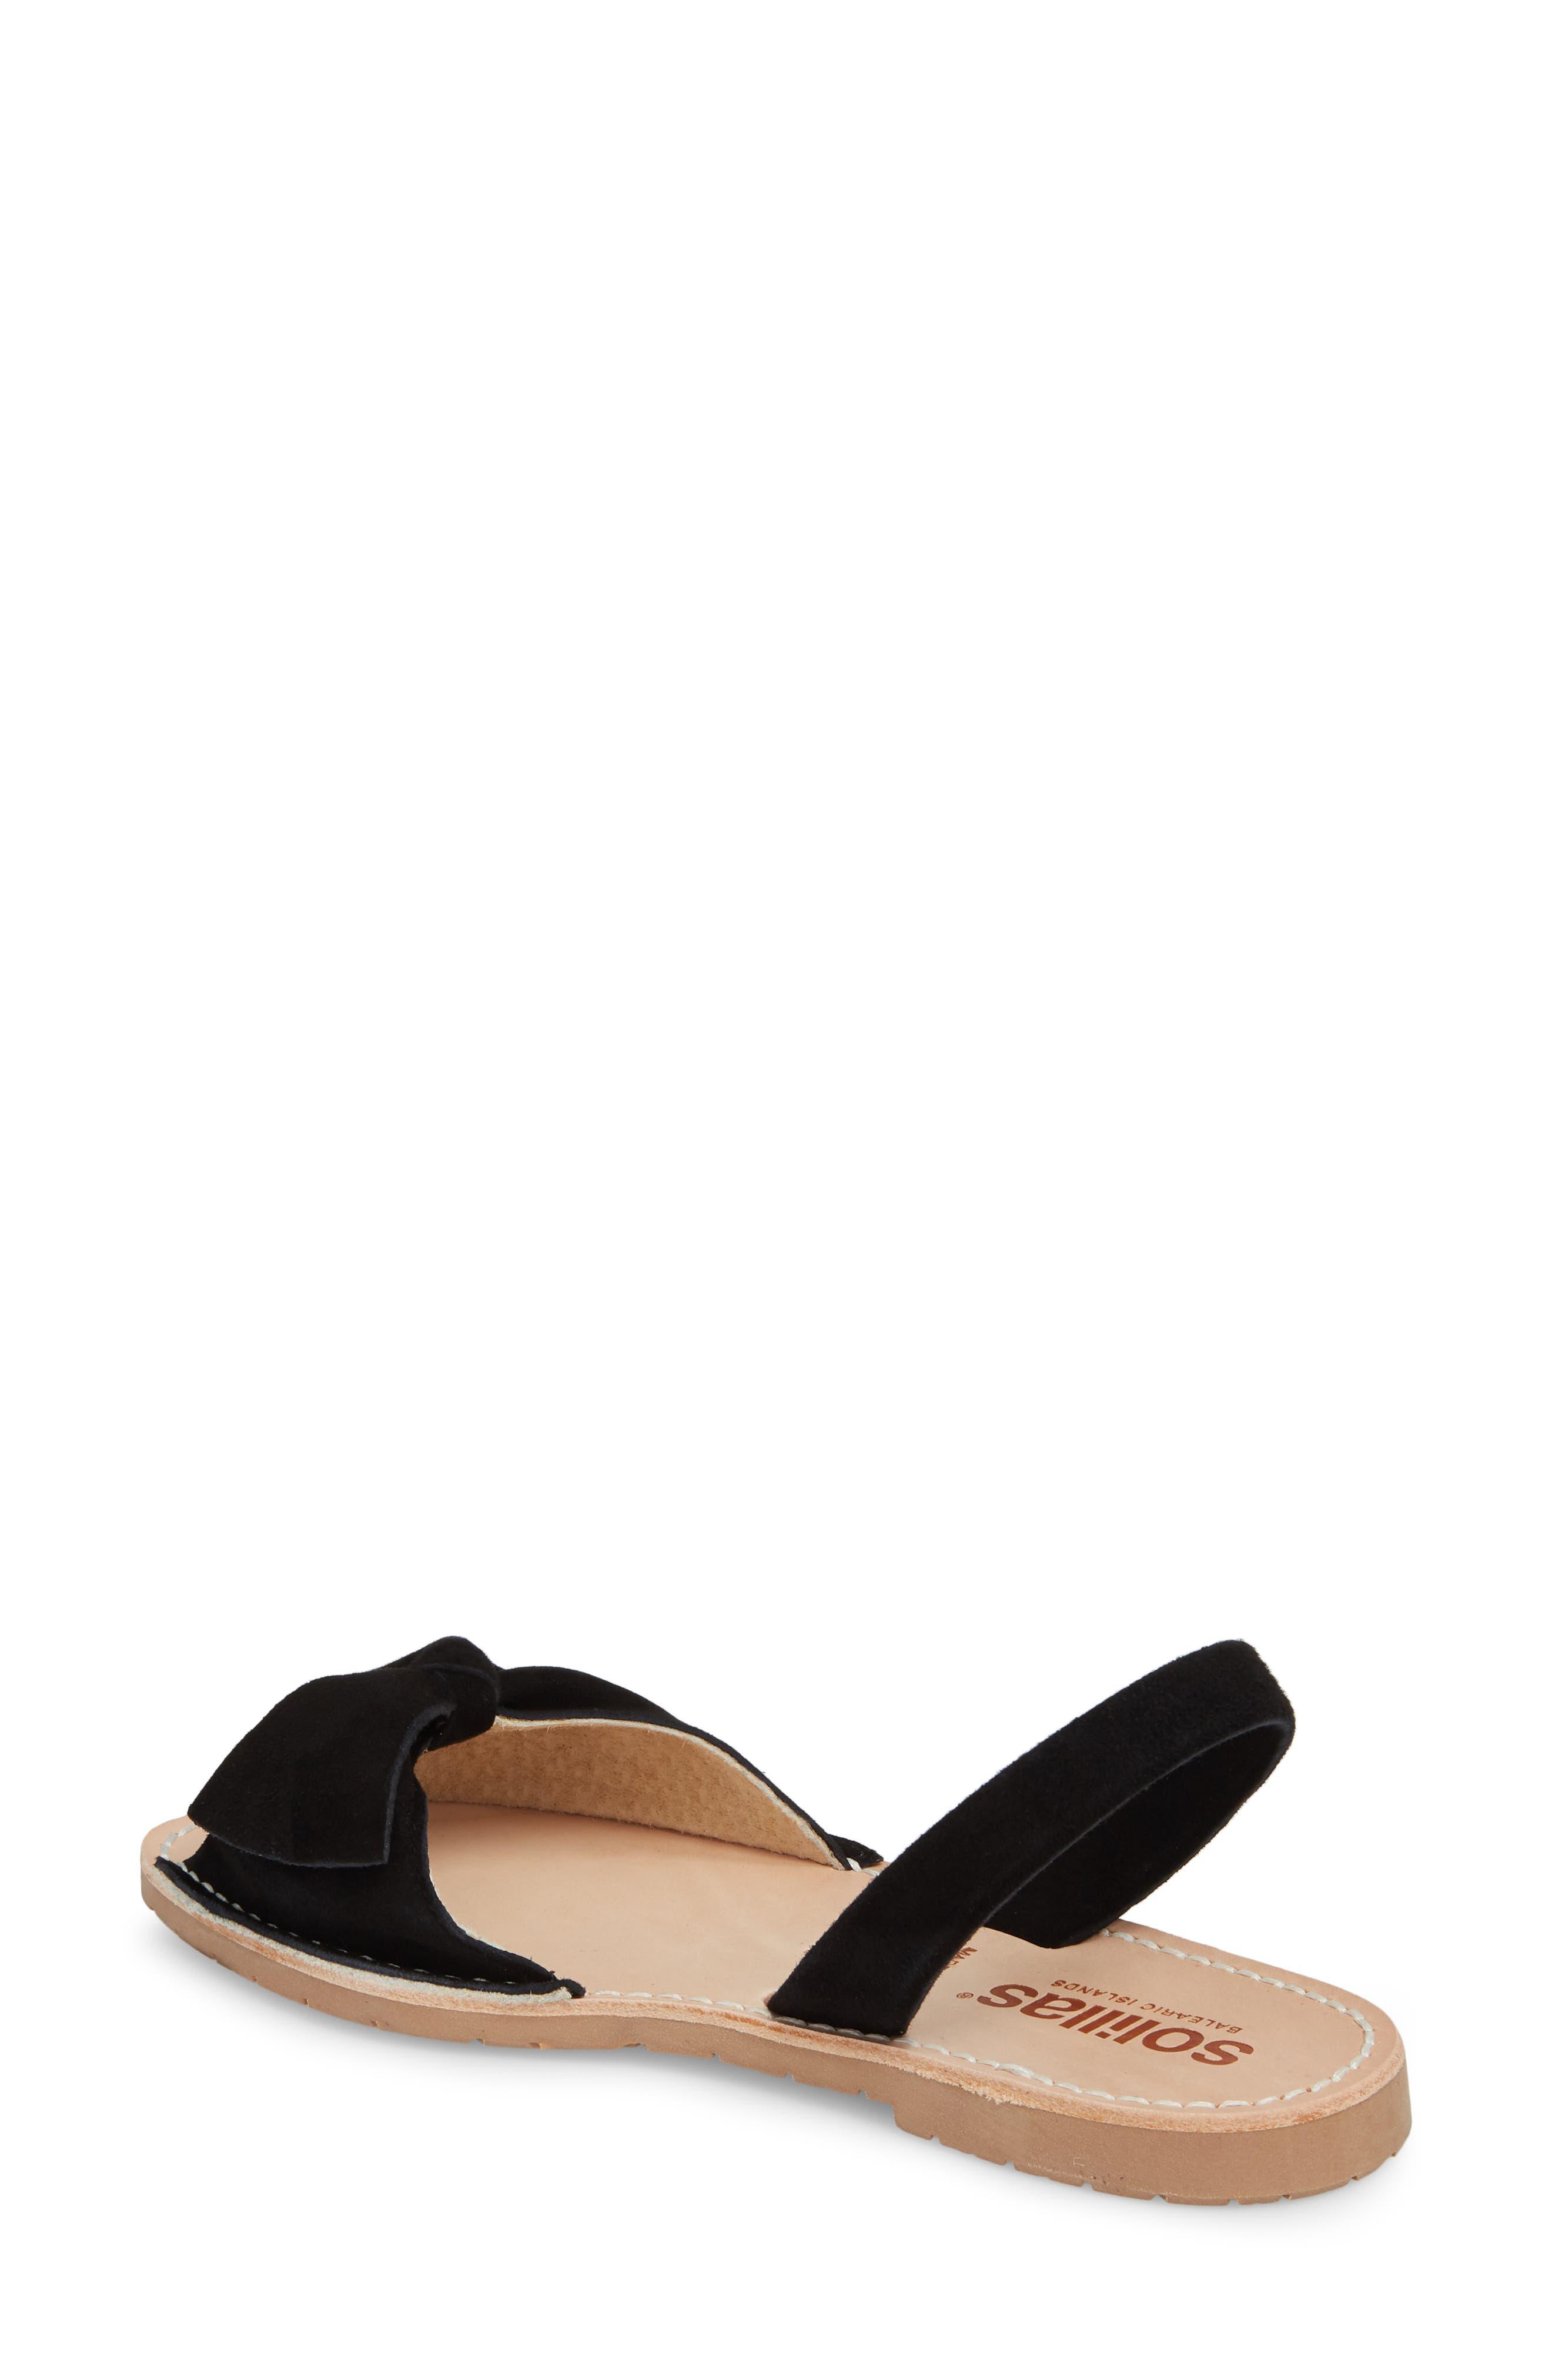 Bow Sandal,                             Alternate thumbnail 2, color,                             BLACK